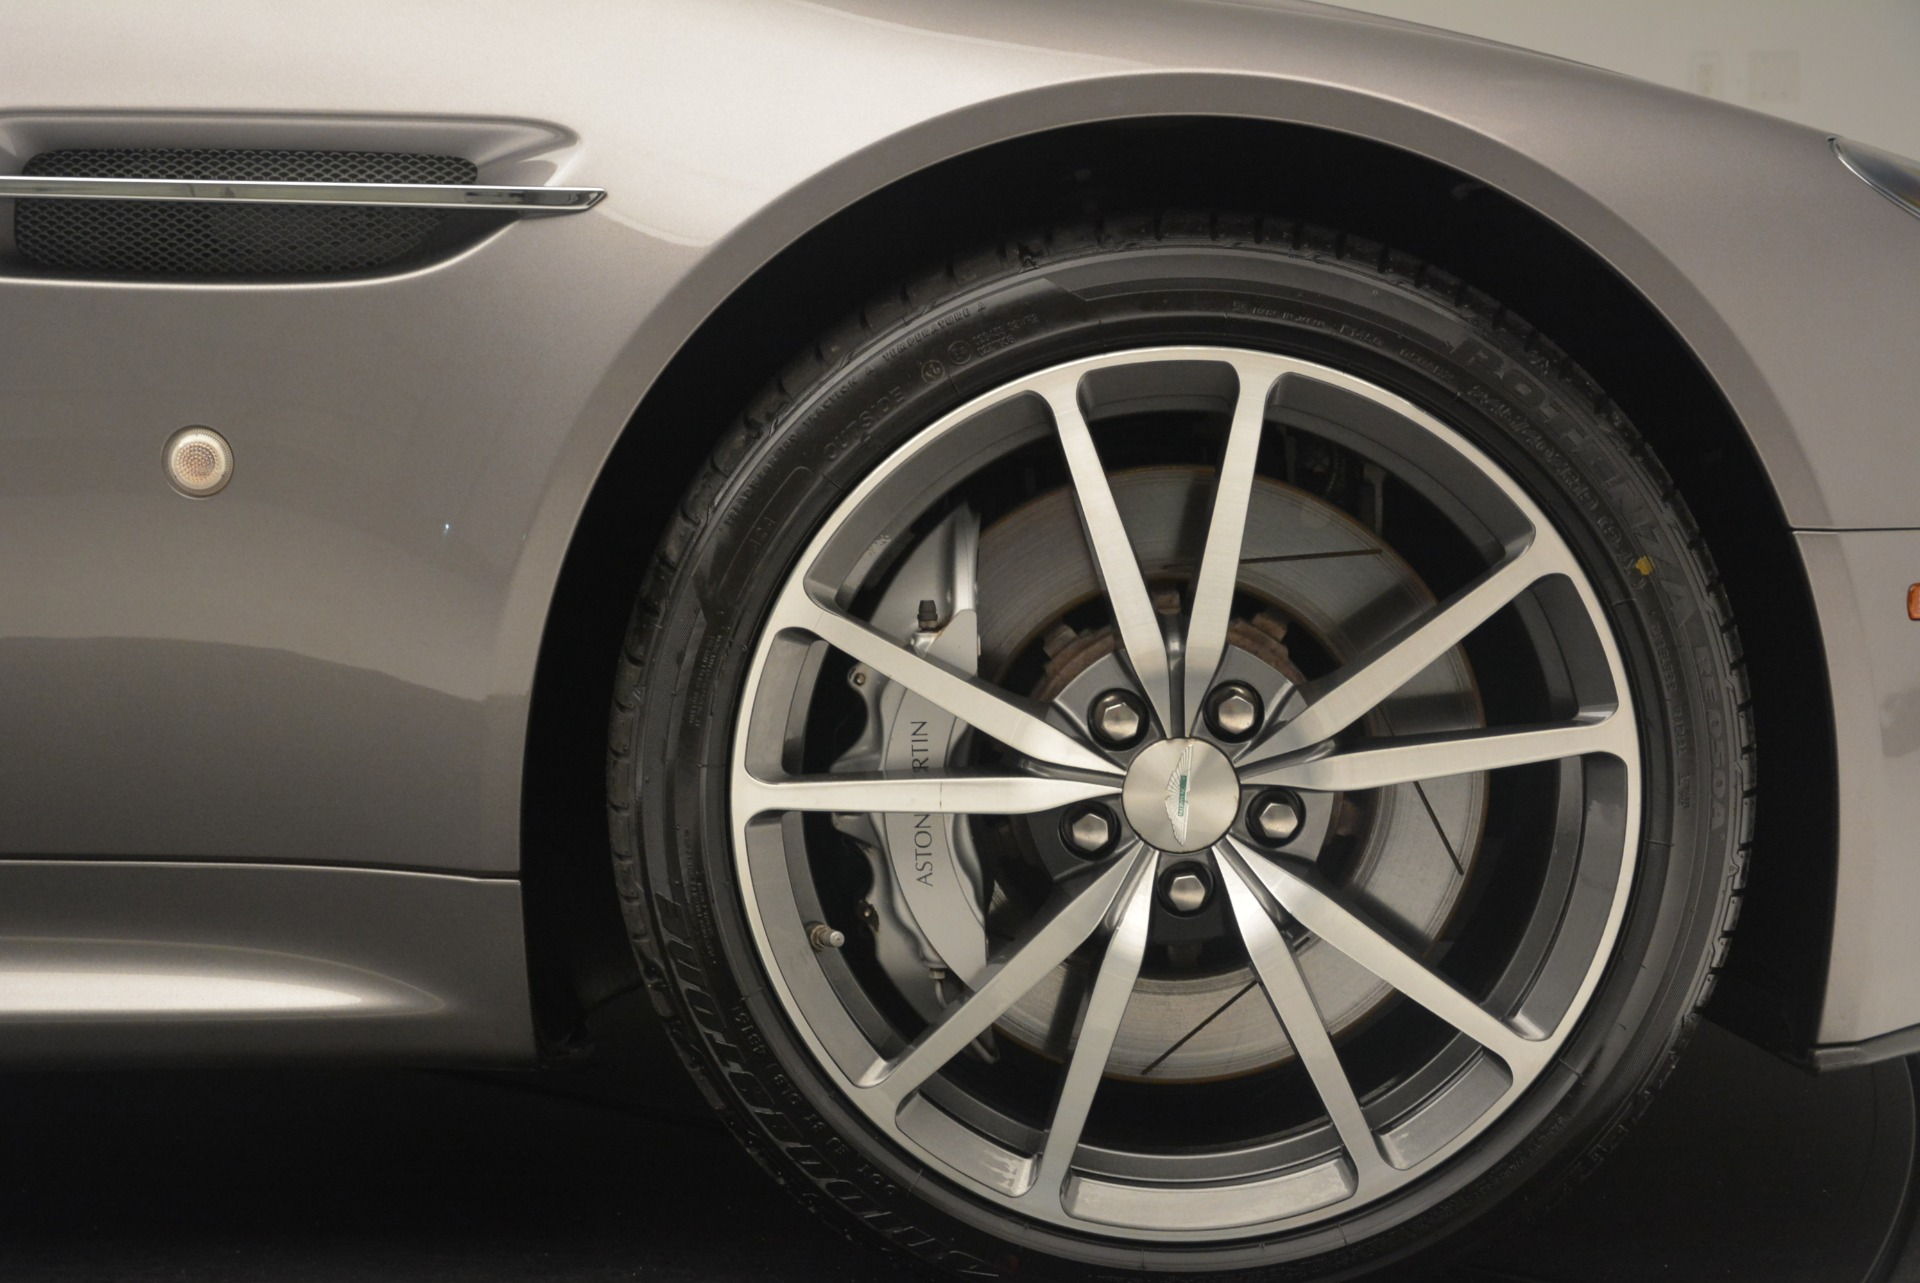 Used 2015 Aston Martin V8 Vantage Roadster For Sale In Greenwich, CT. Alfa Romeo of Greenwich, 7396 2463_p24